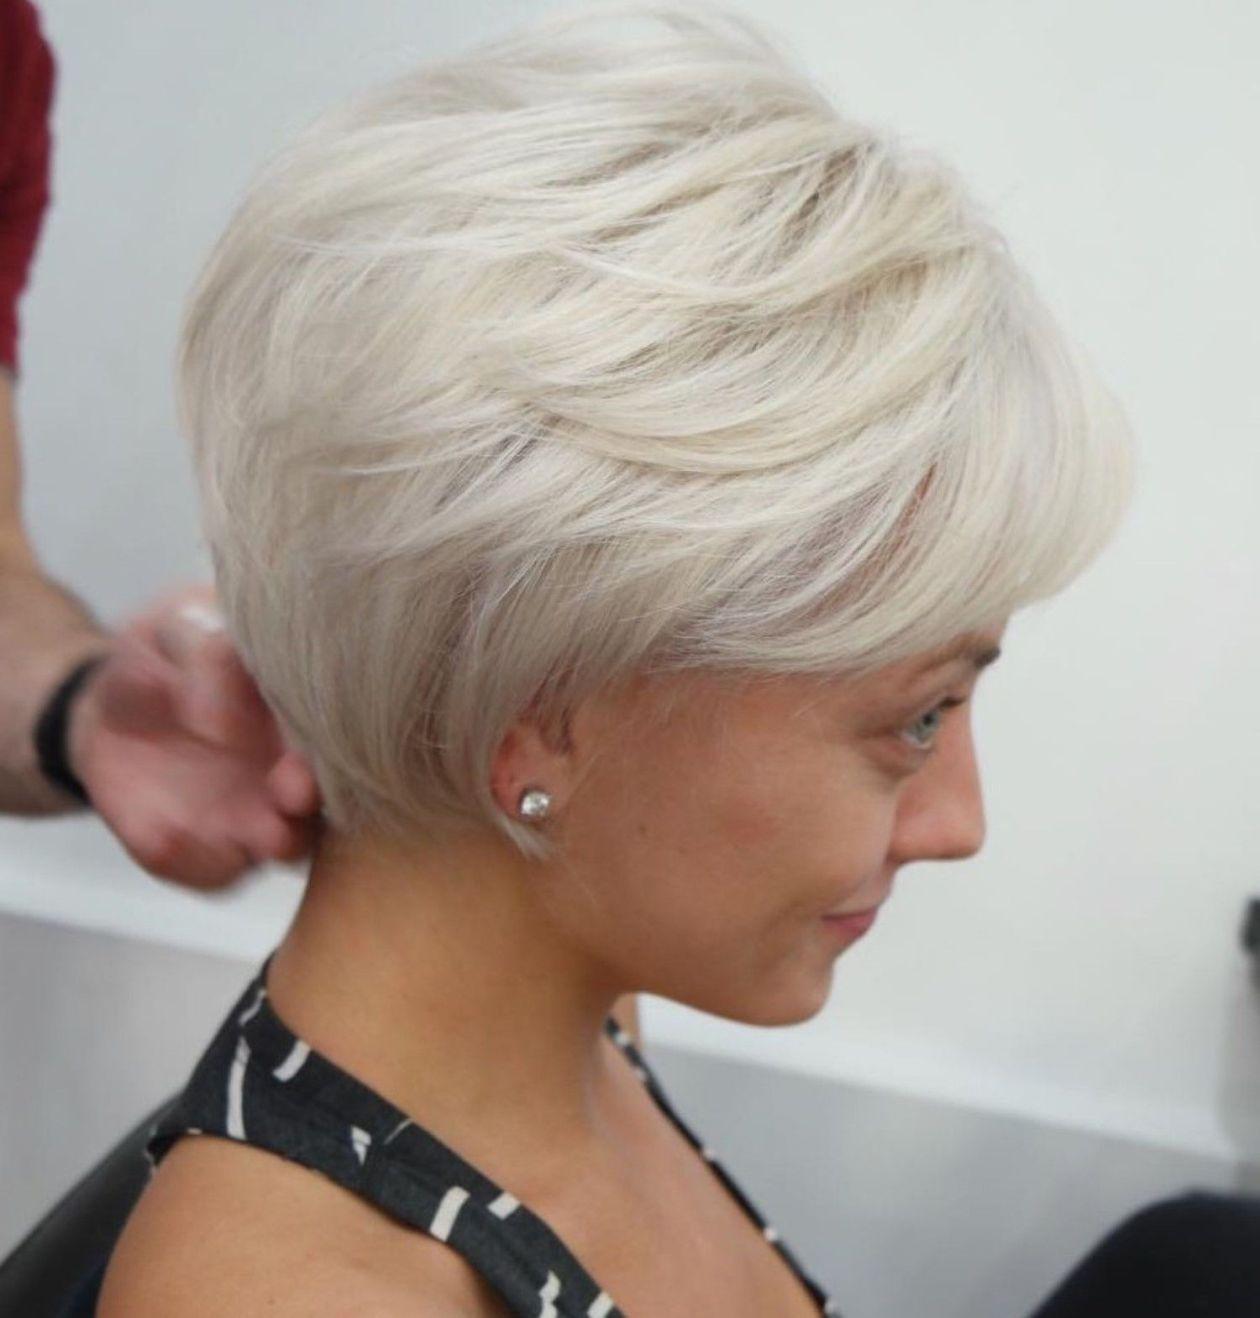 Short Haircut With Feathered Layers Short Hair With Layers Short Hair Styles Easy Short Layered Haircuts